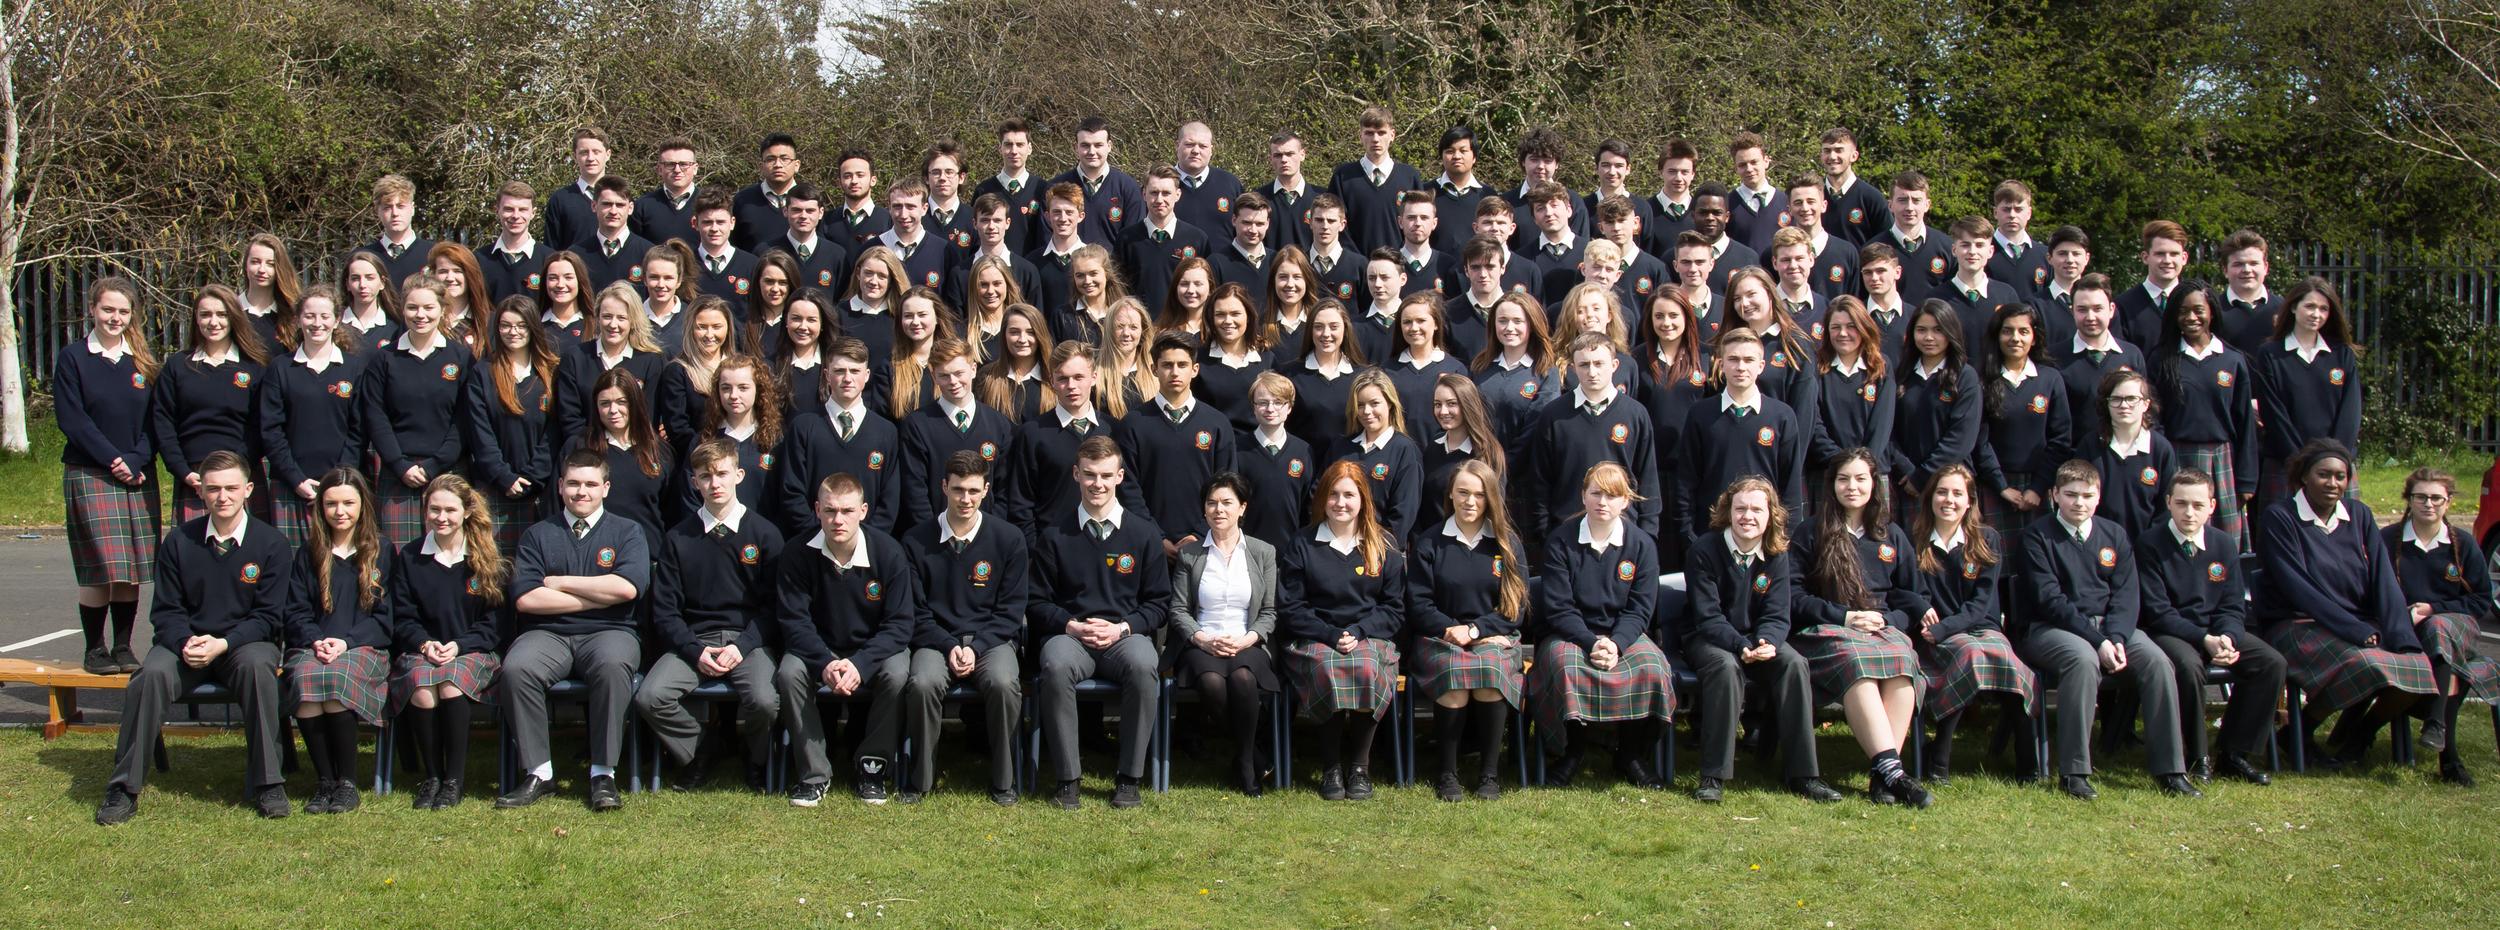 Graduating Class 2016